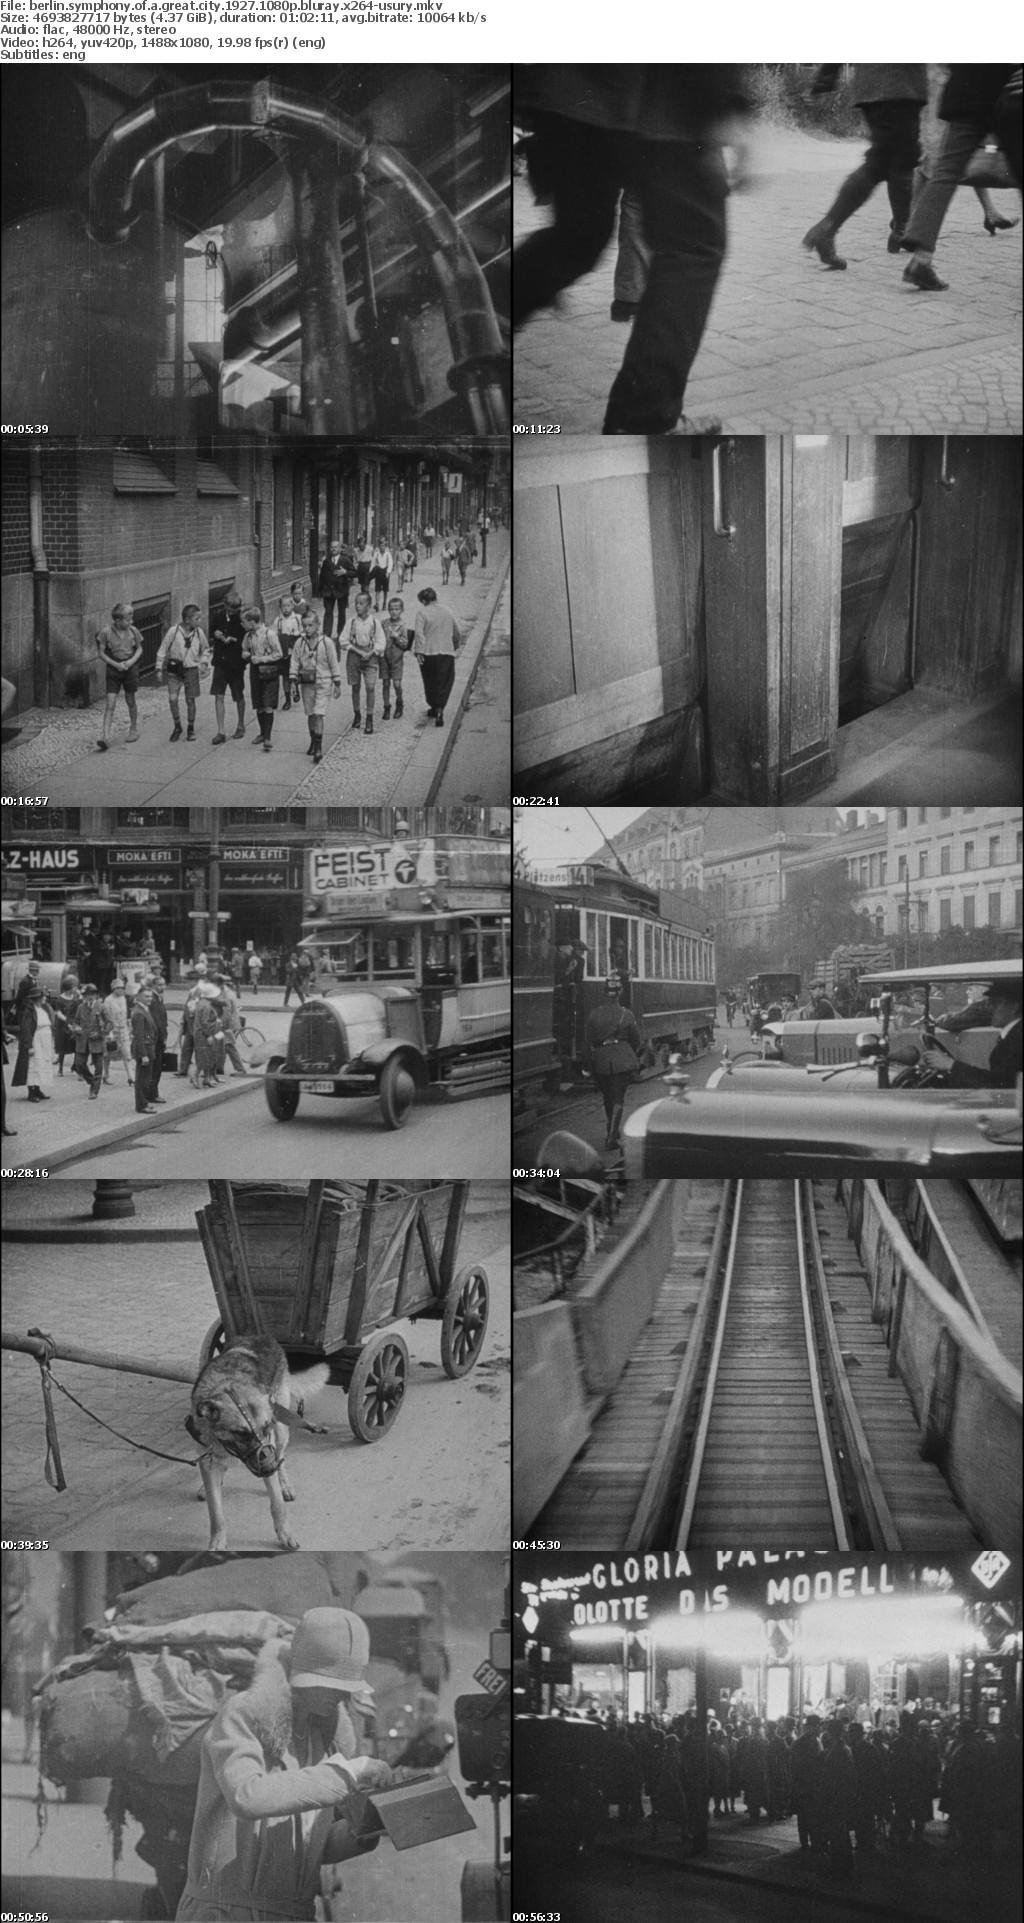 Berlin Symphony of a Great City 1927 1080p BluRay x264-USURYrarbg